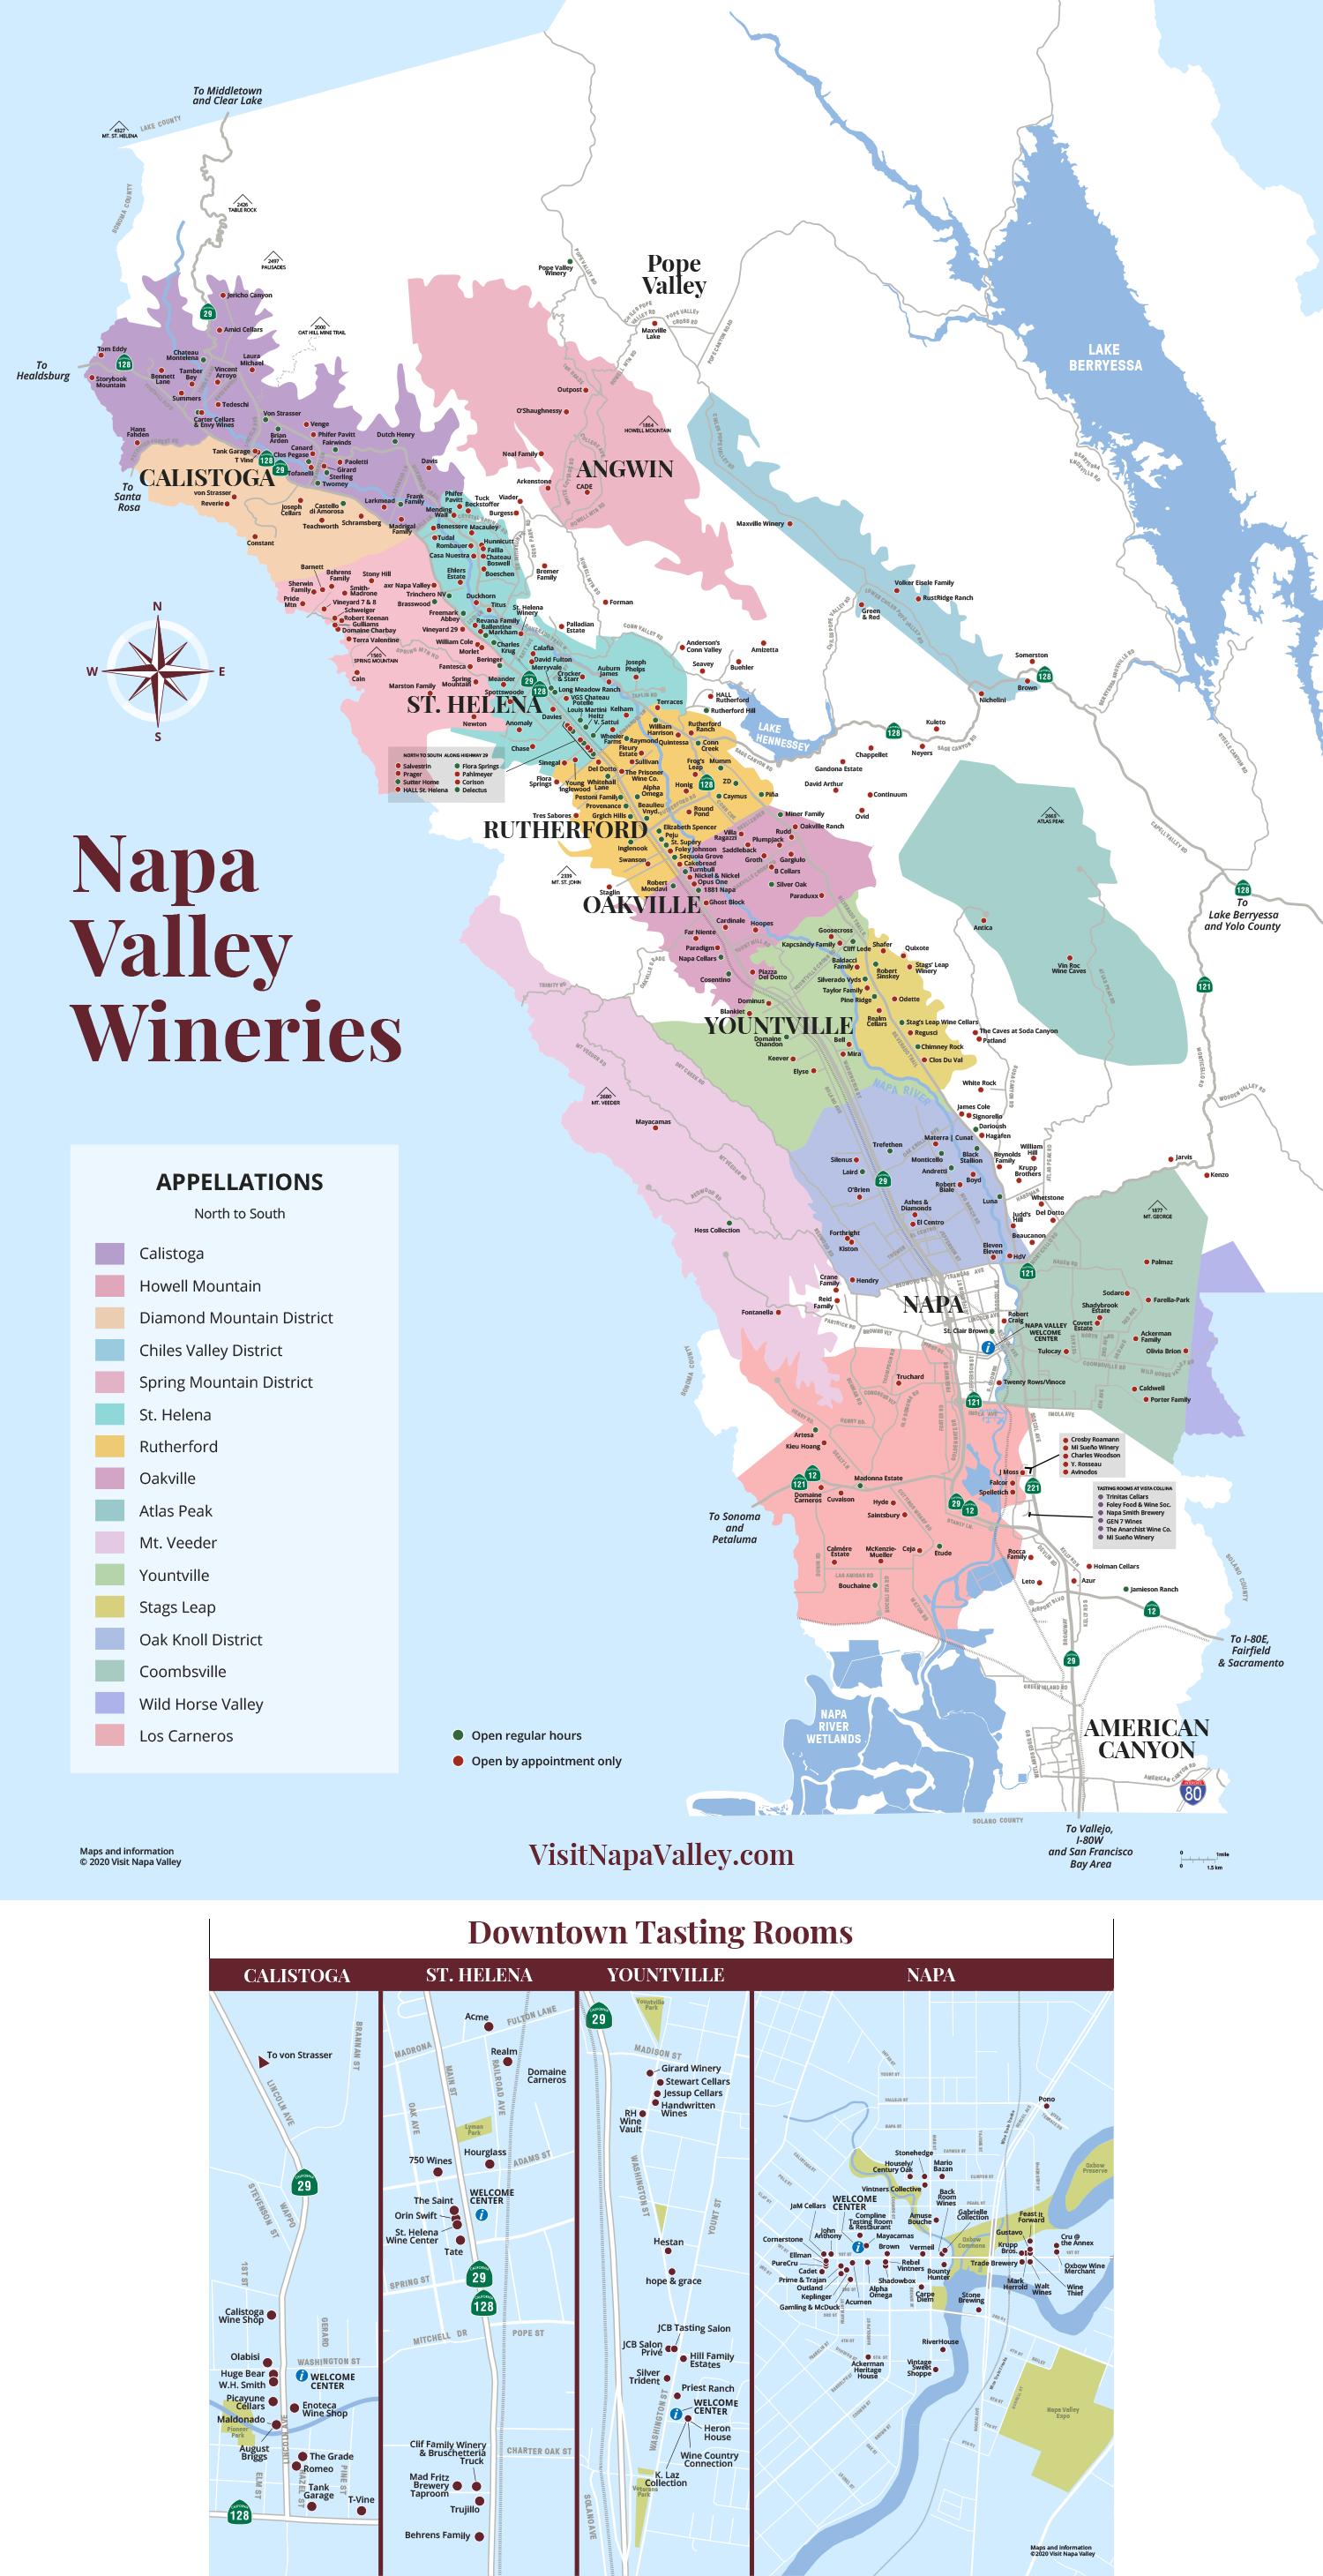 Napa Valley Wineries & Tasting Rooms Map